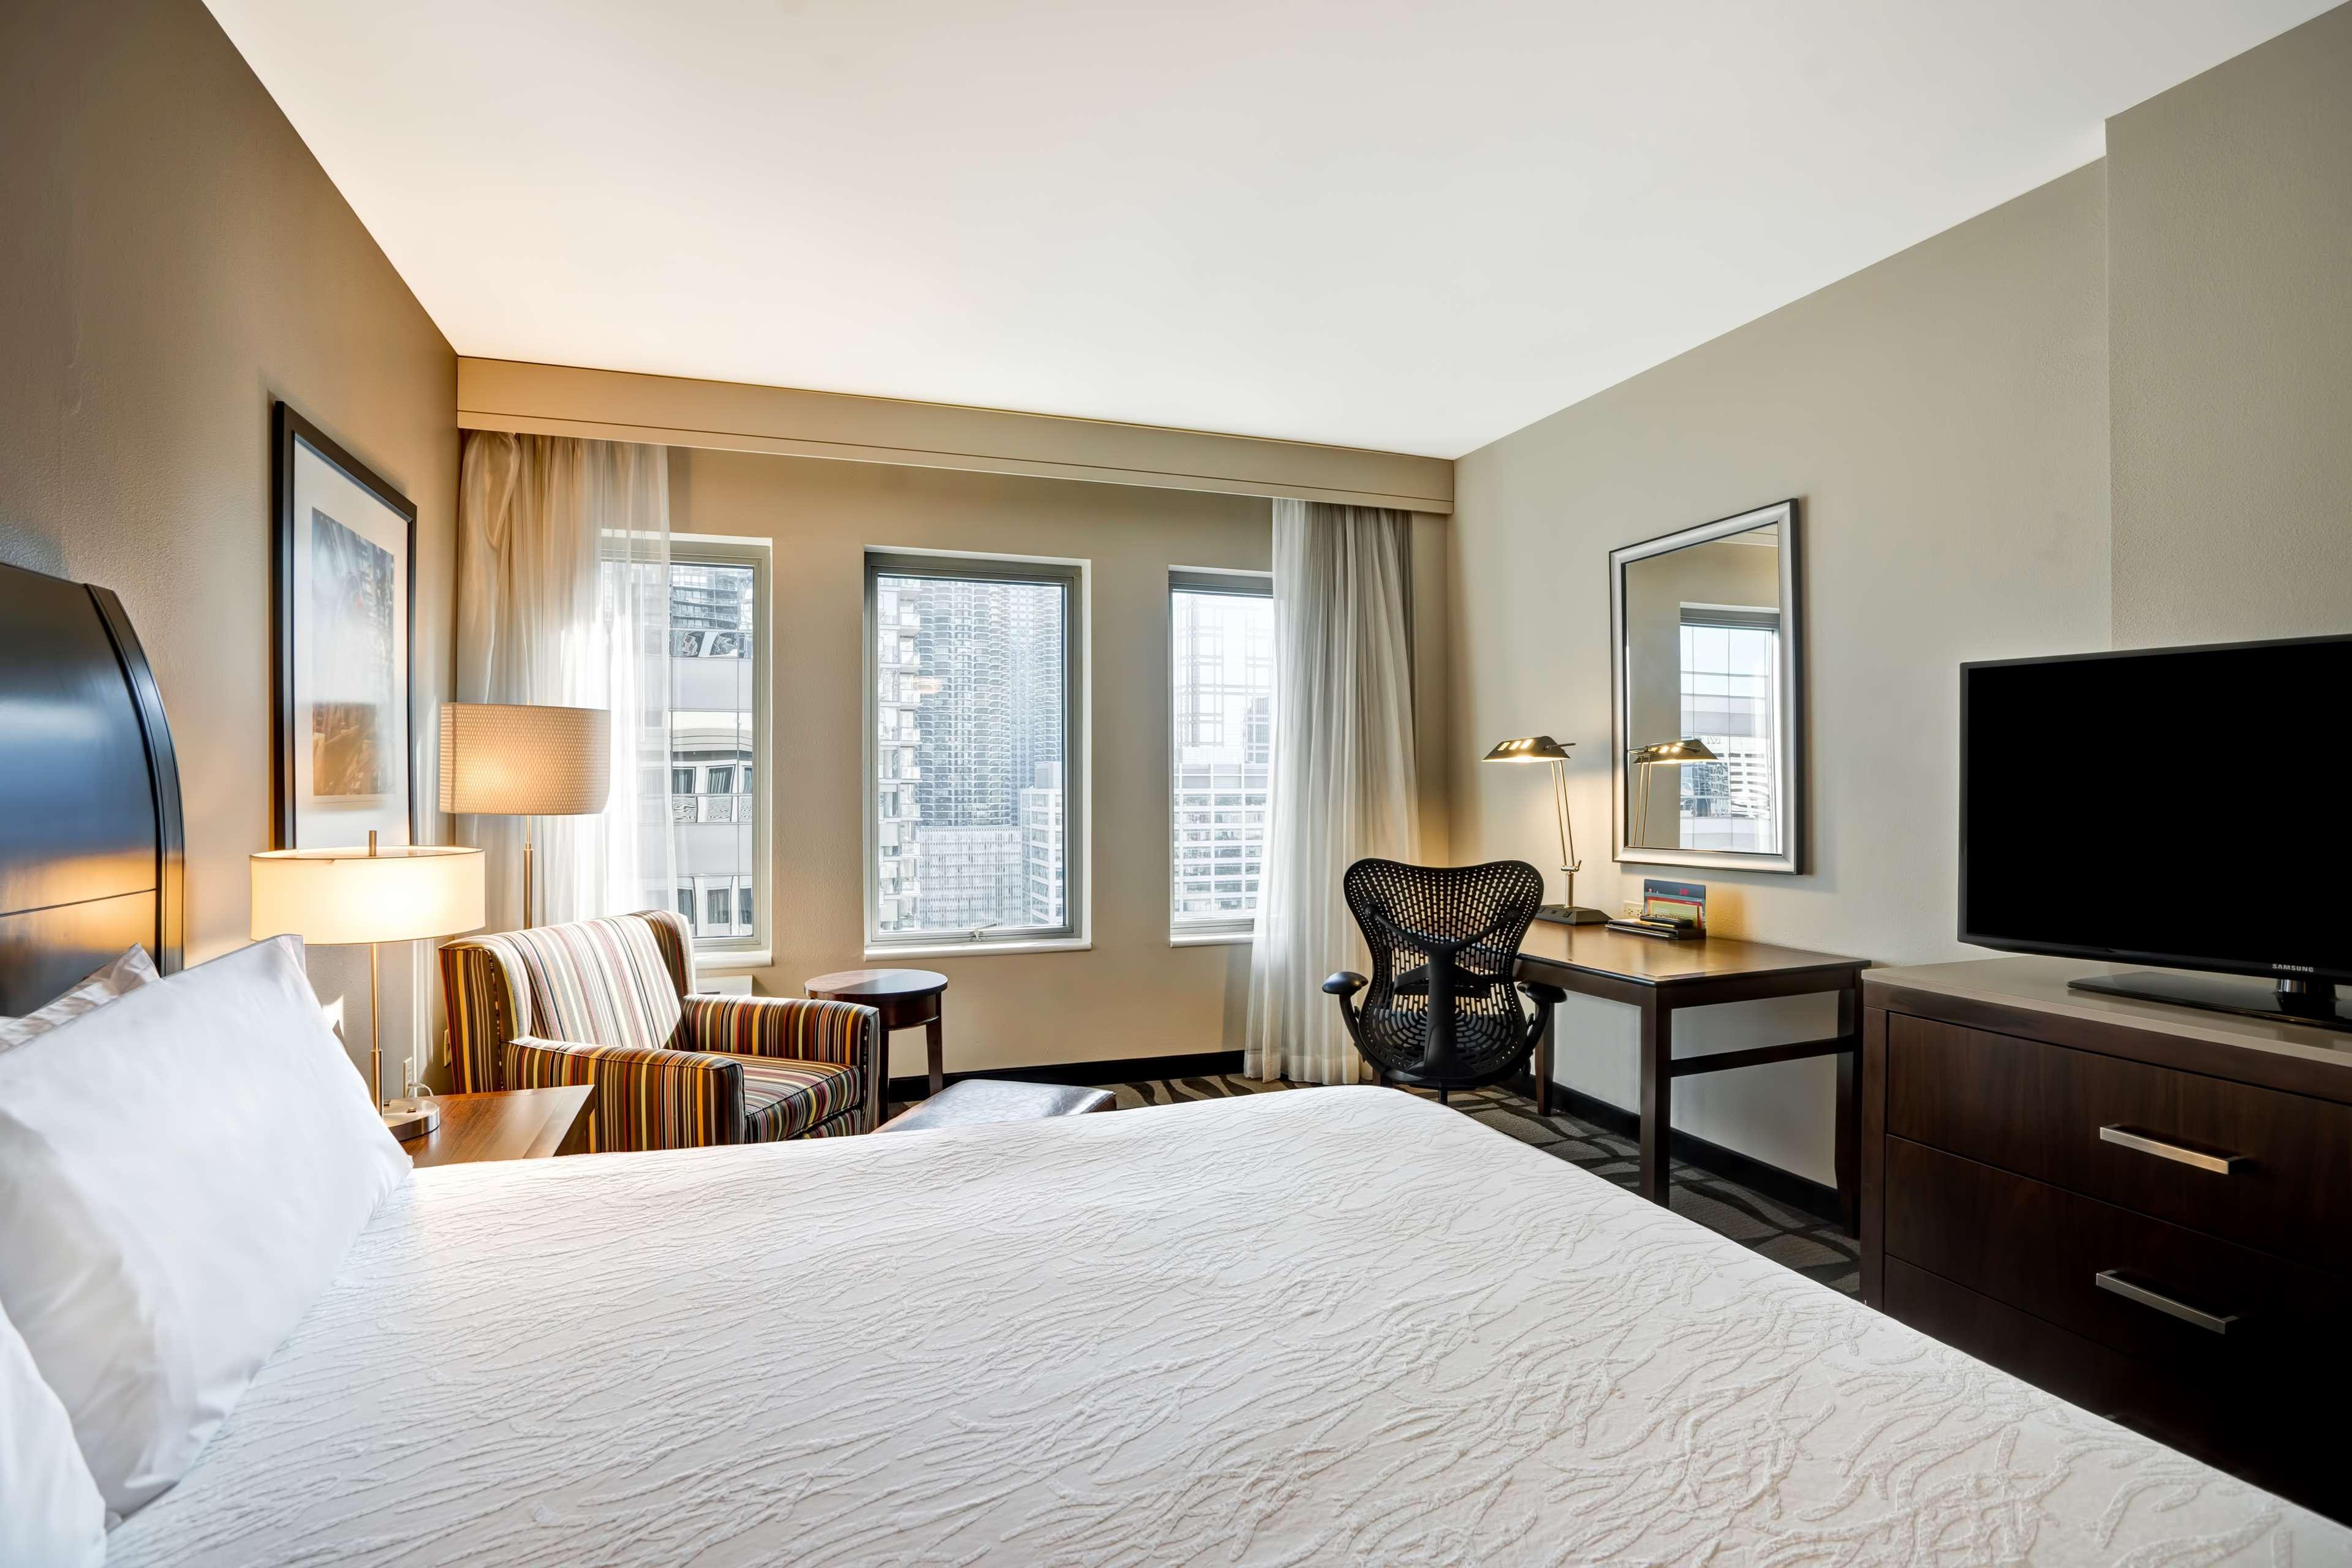 Hilton Garden Inn Chicago Downtown/Magnificent Mile image 15